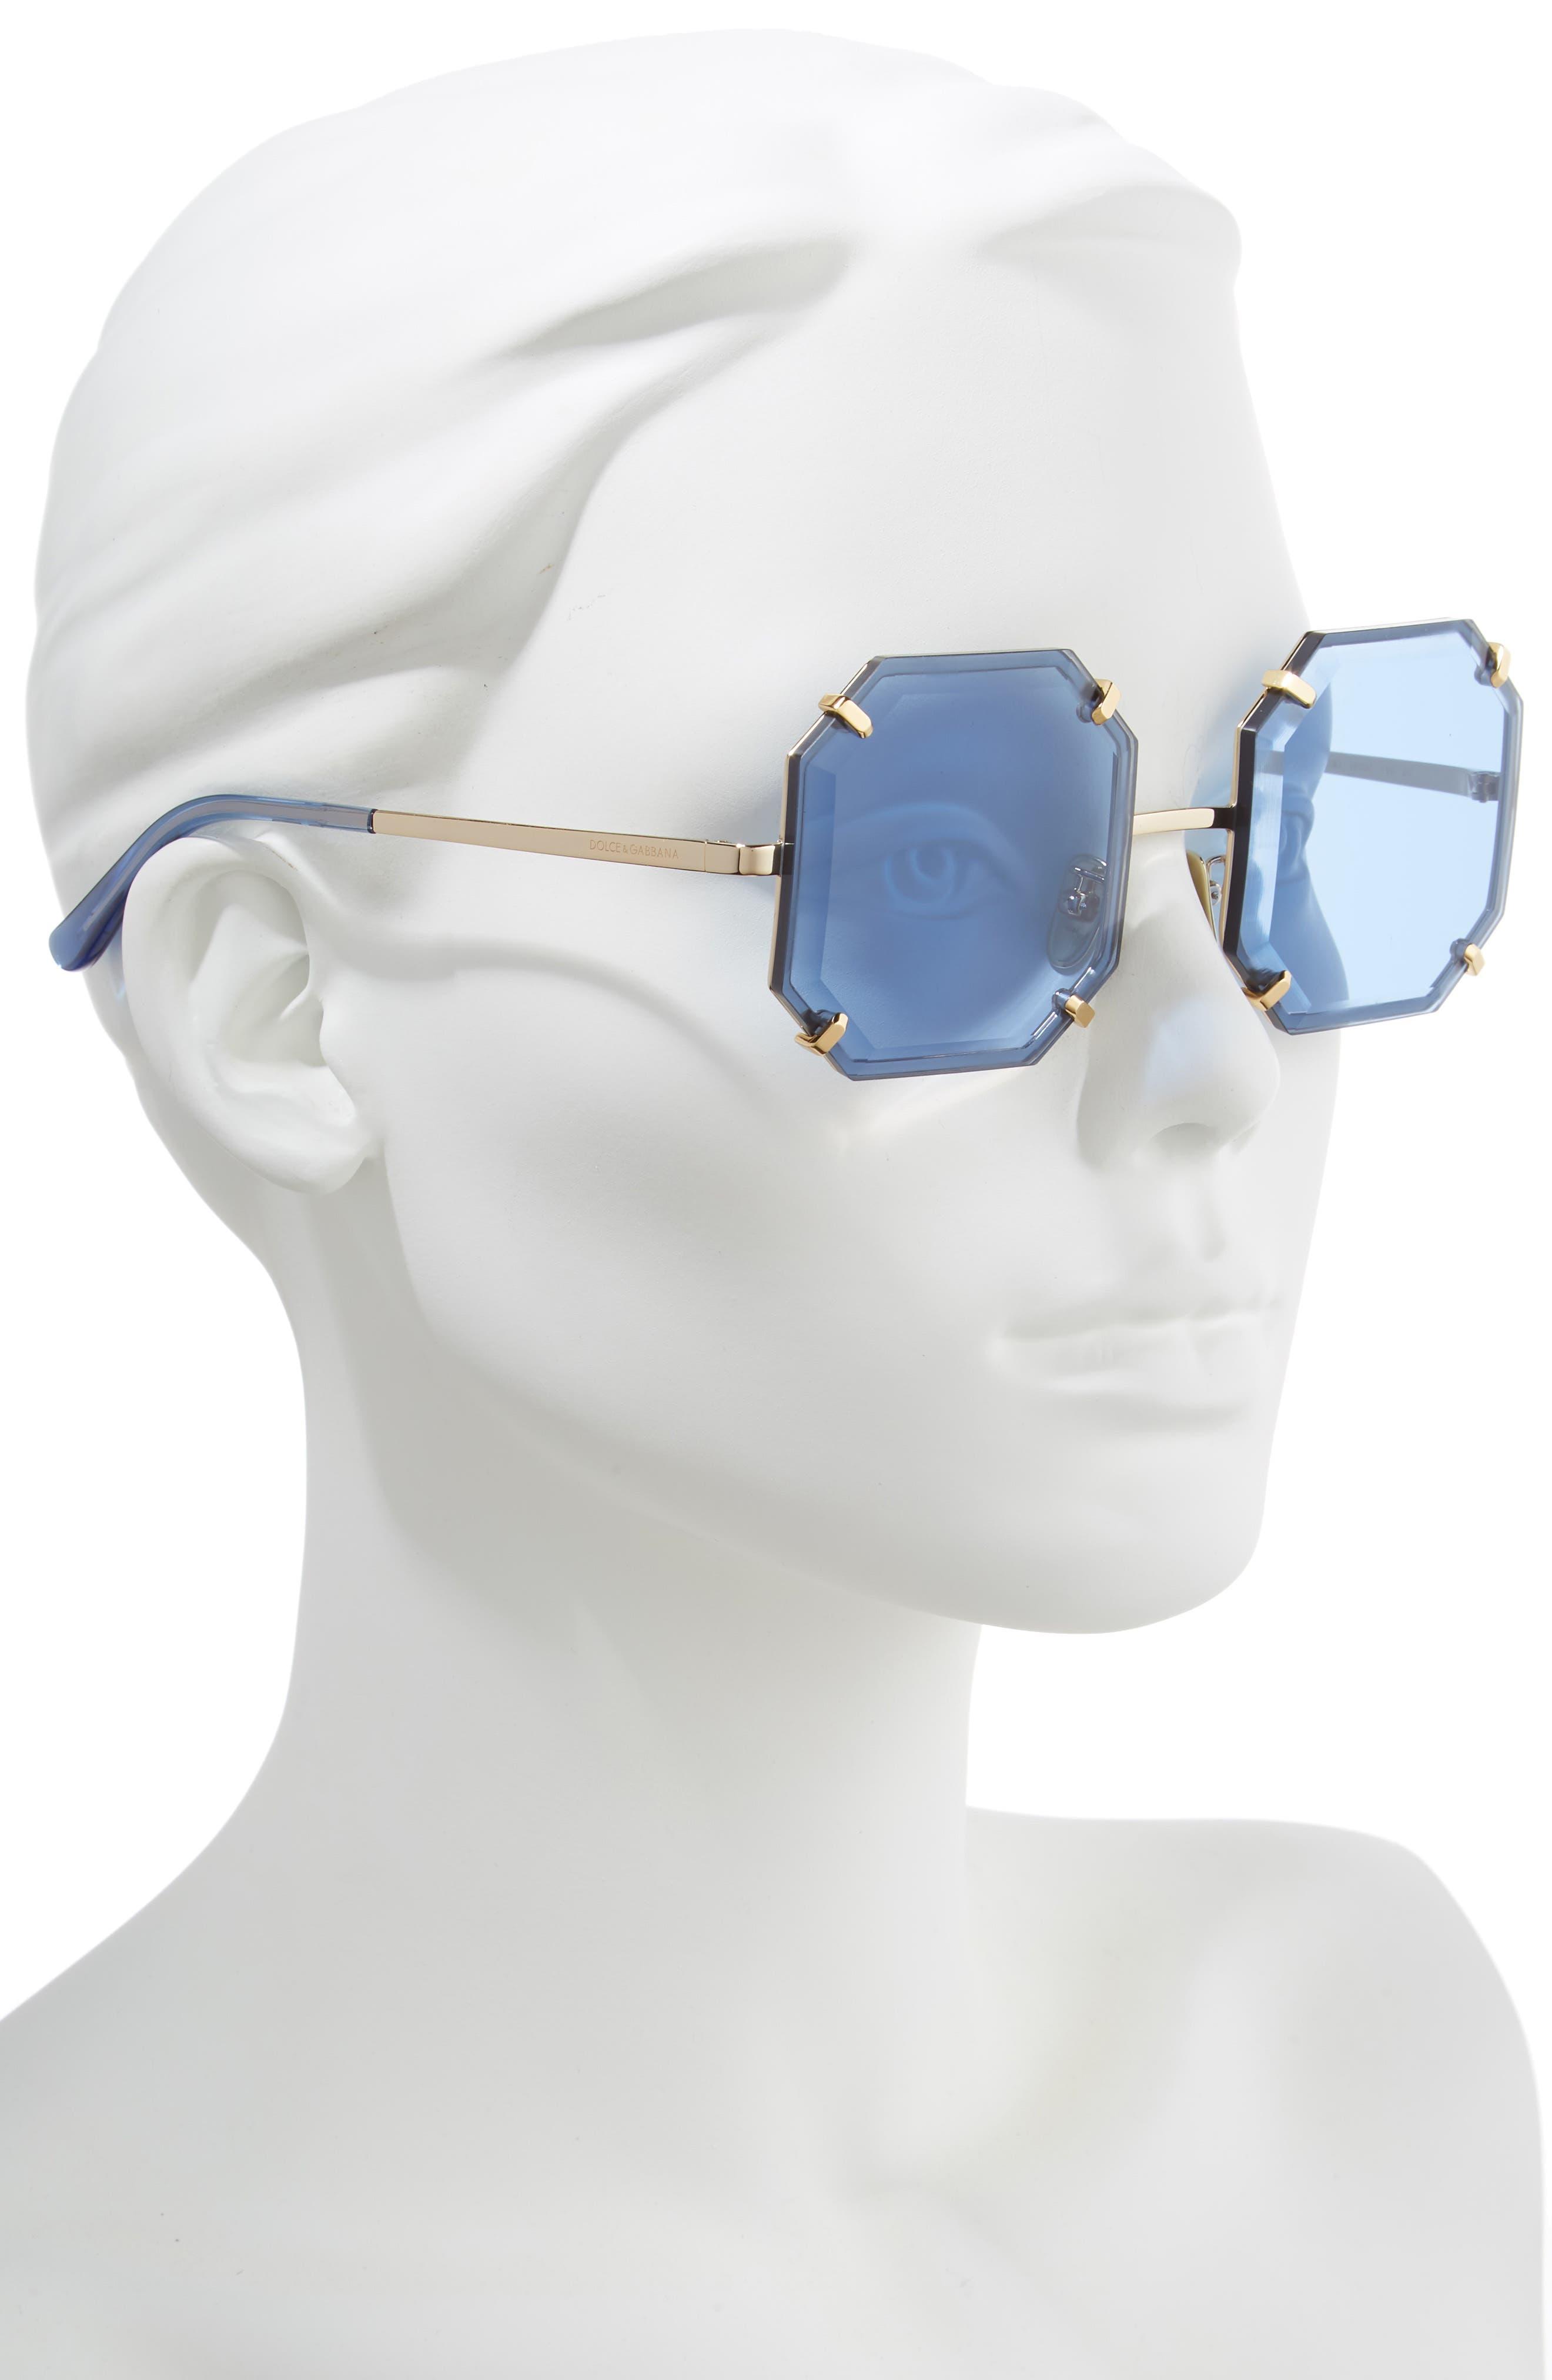 Jewel 55mm Octagonal Sunglasses,                             Alternate thumbnail 2, color,                             SILVER/ BLUE SOLID